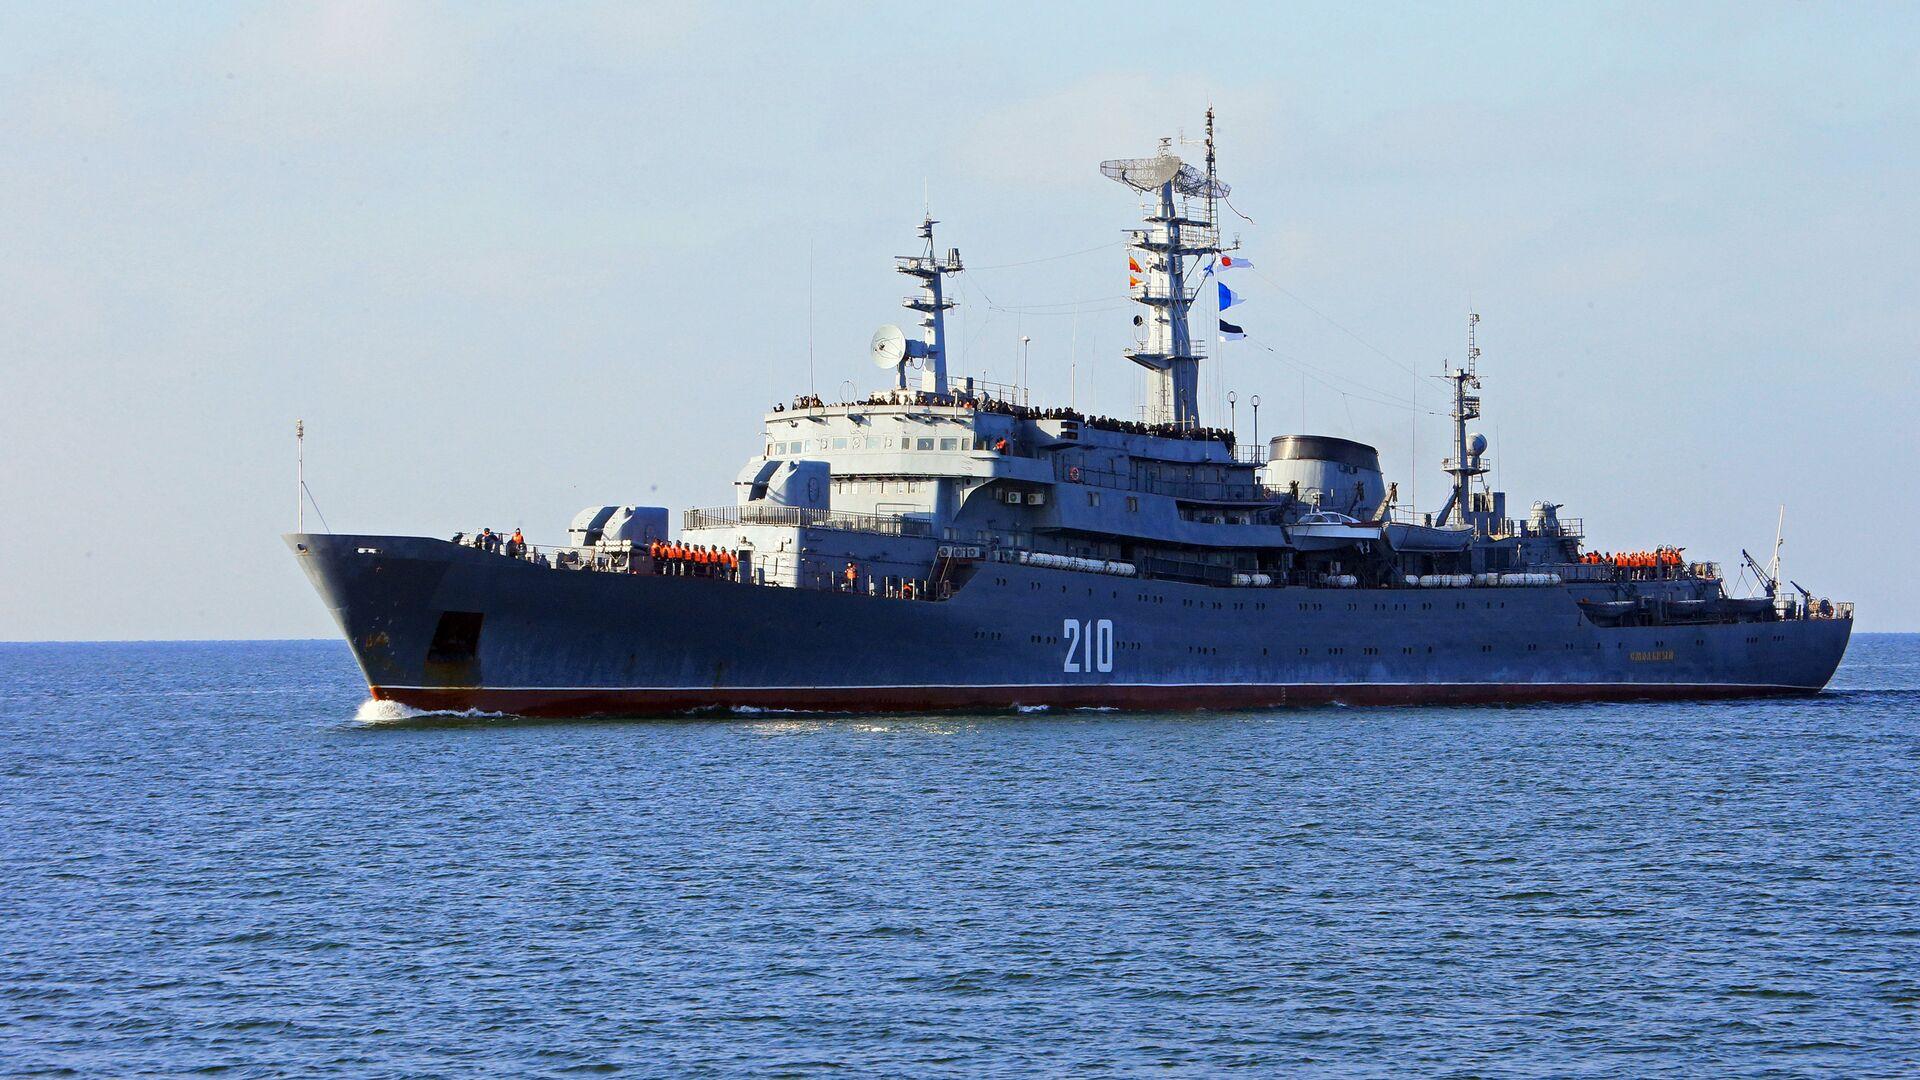 Un buque ruso - Sputnik Mundo, 1920, 20.08.2021